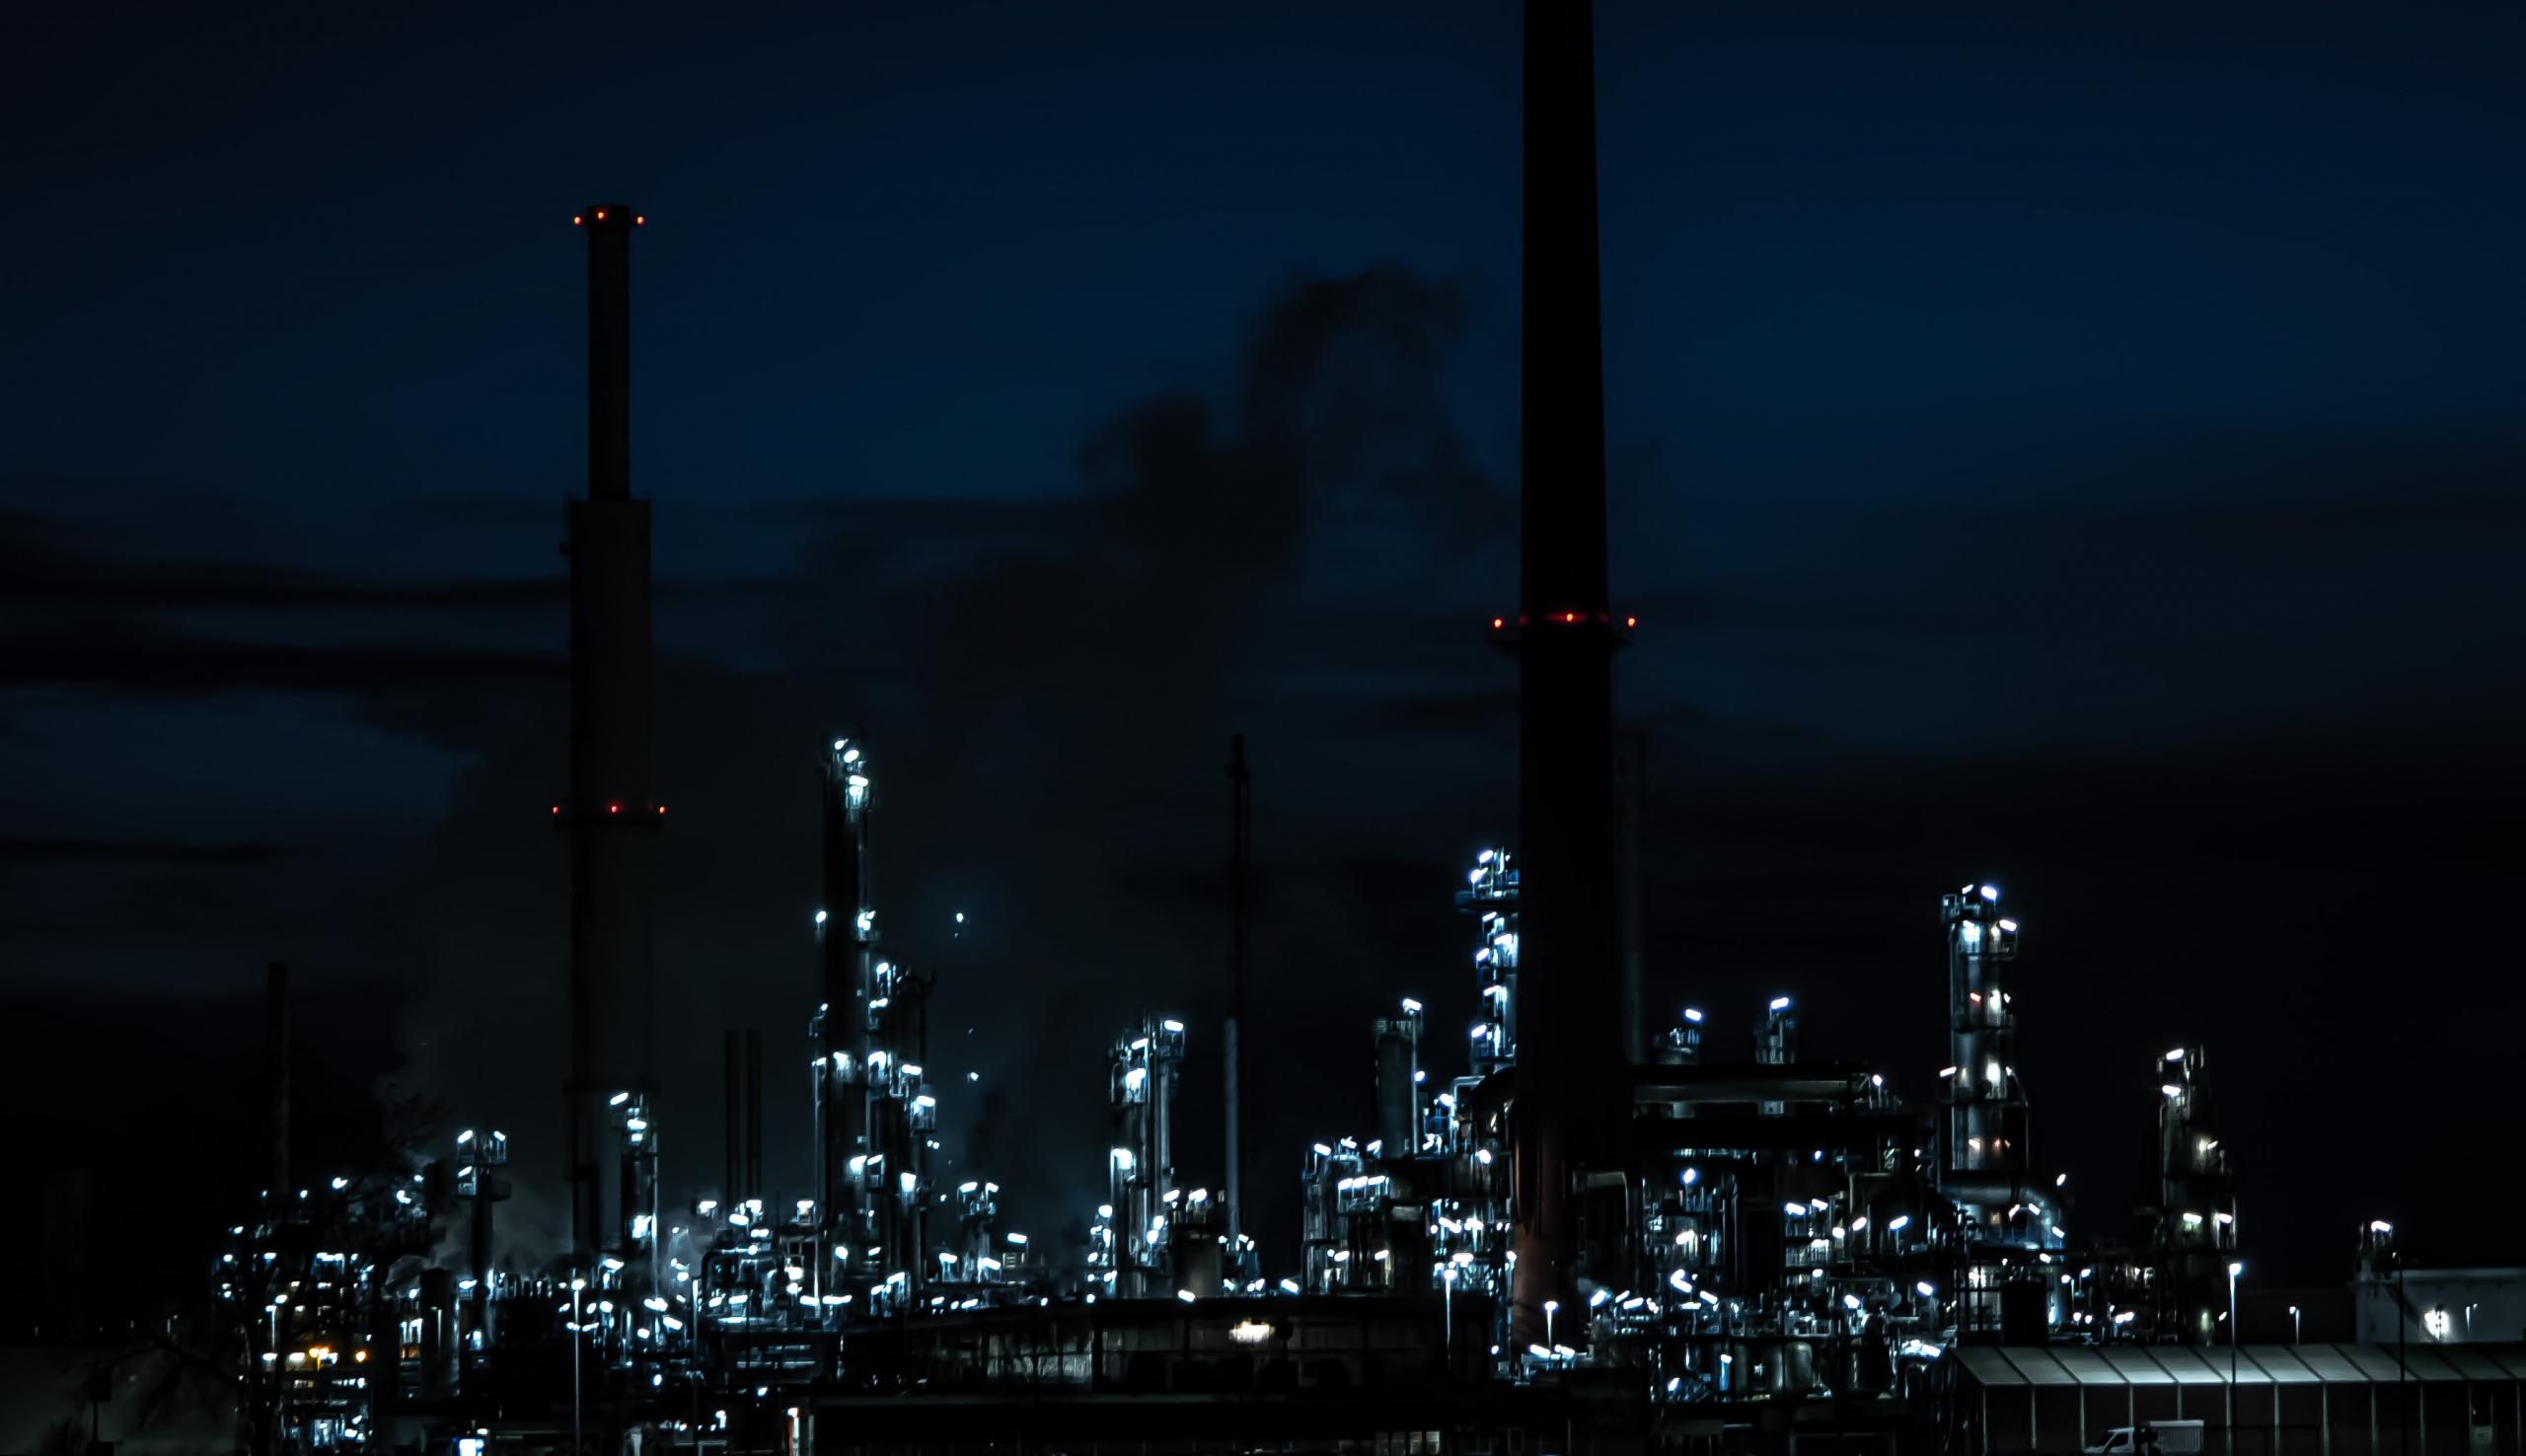 Digitising Industrial Sites: LoRaWAN& WirelessHART